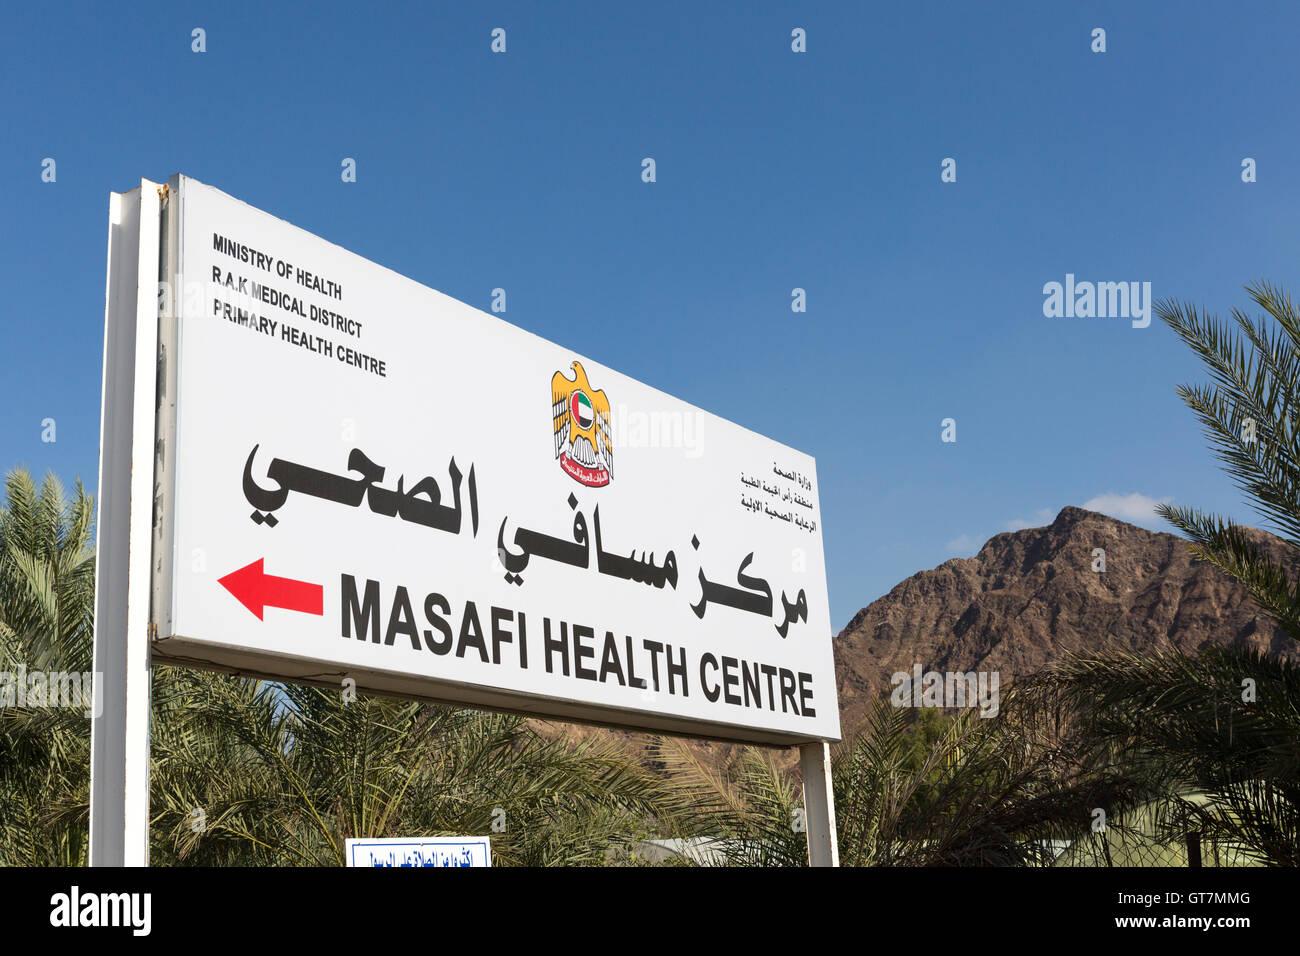 Masafi Health Centre sign - Stock Image